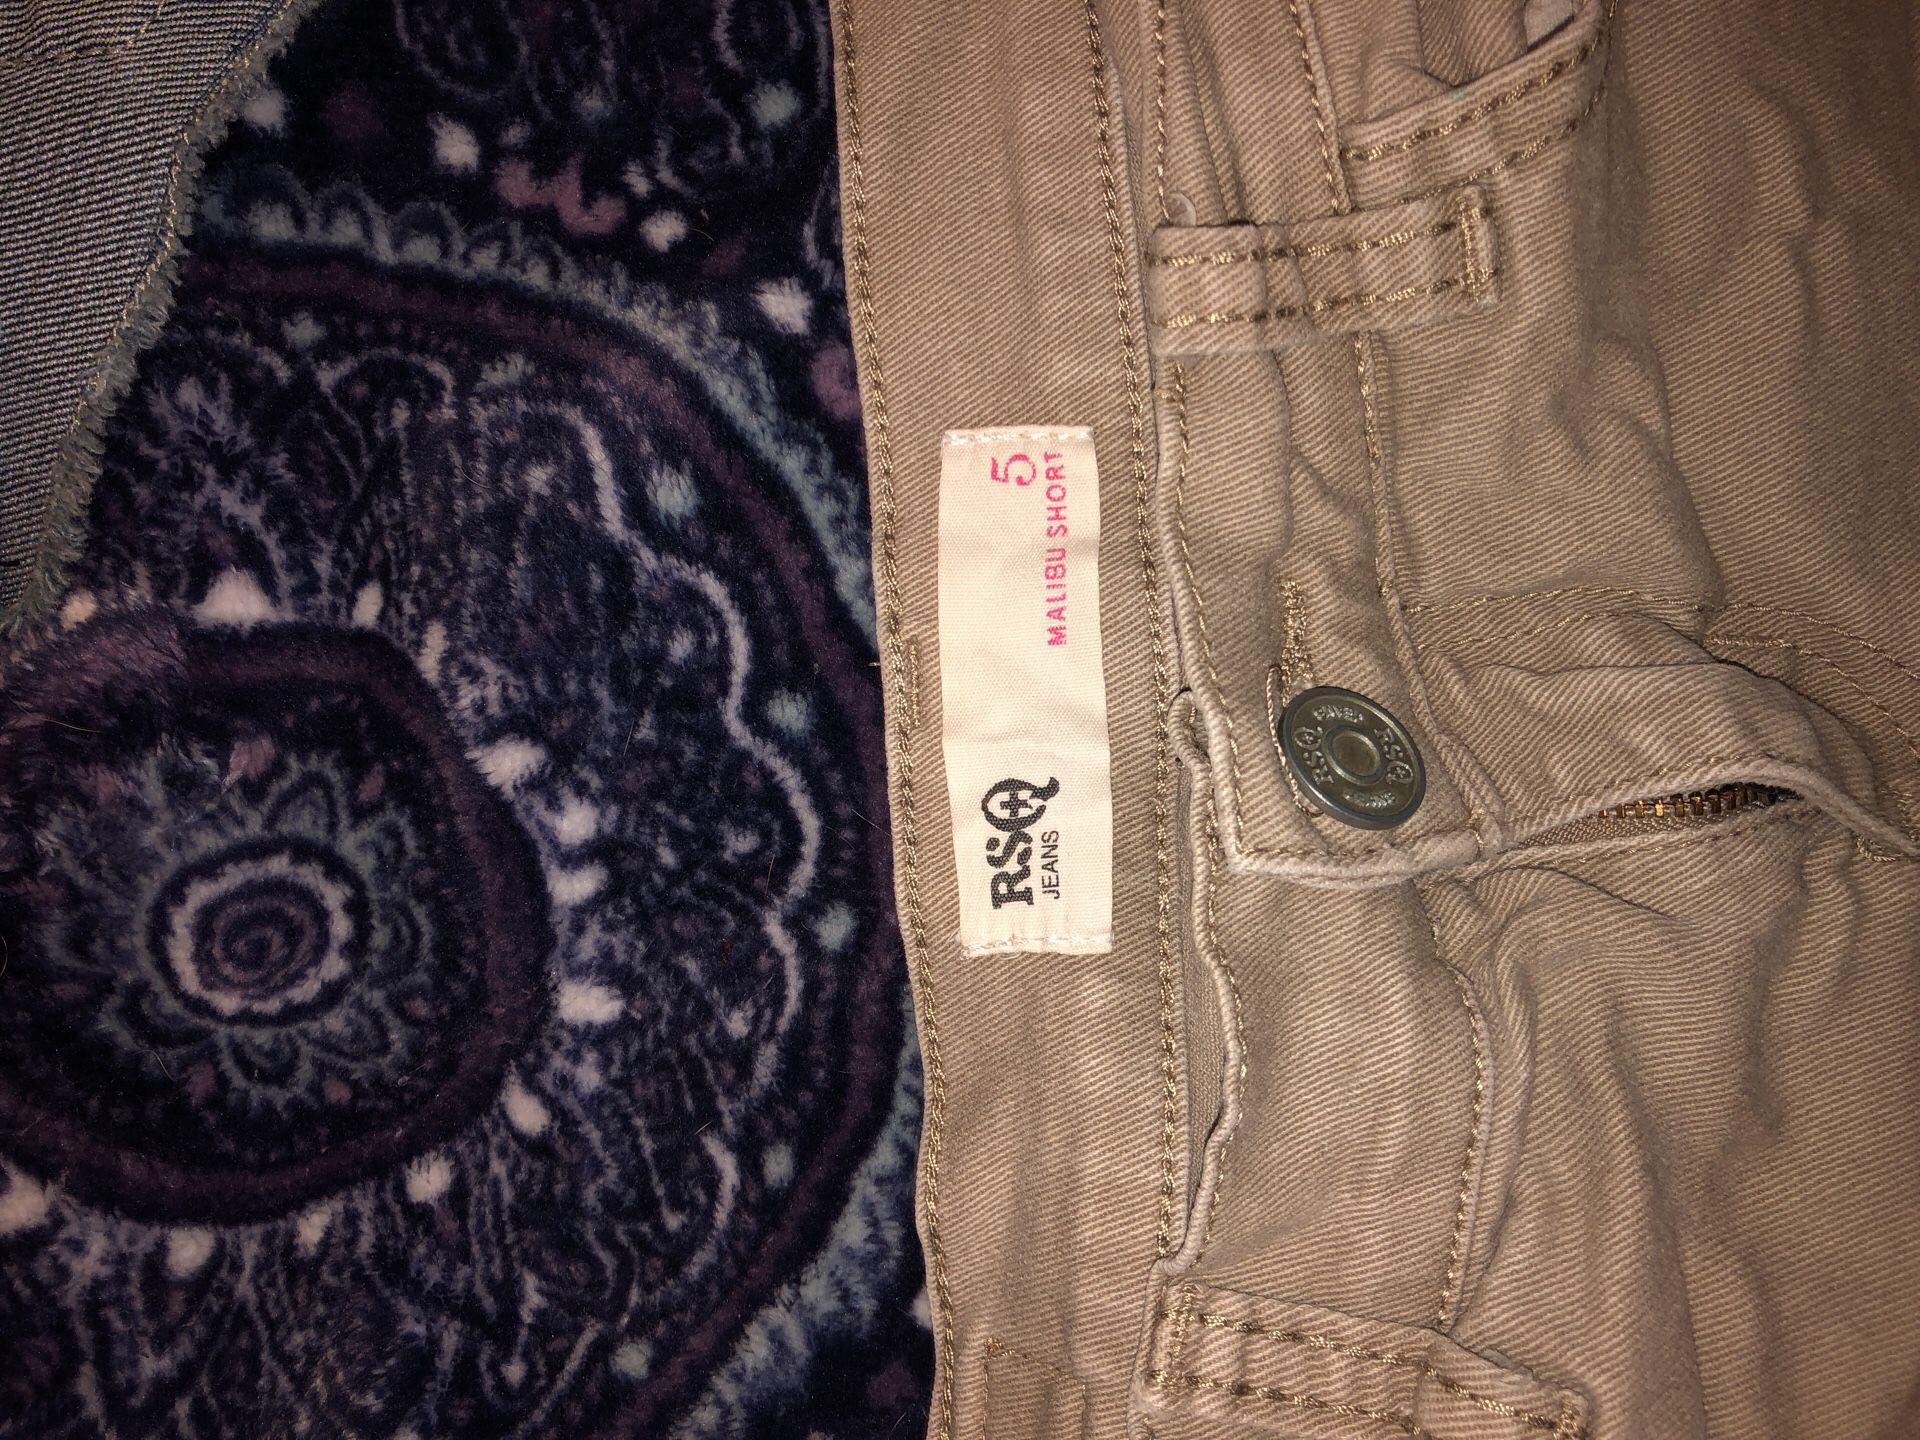 Summer shorts for teens